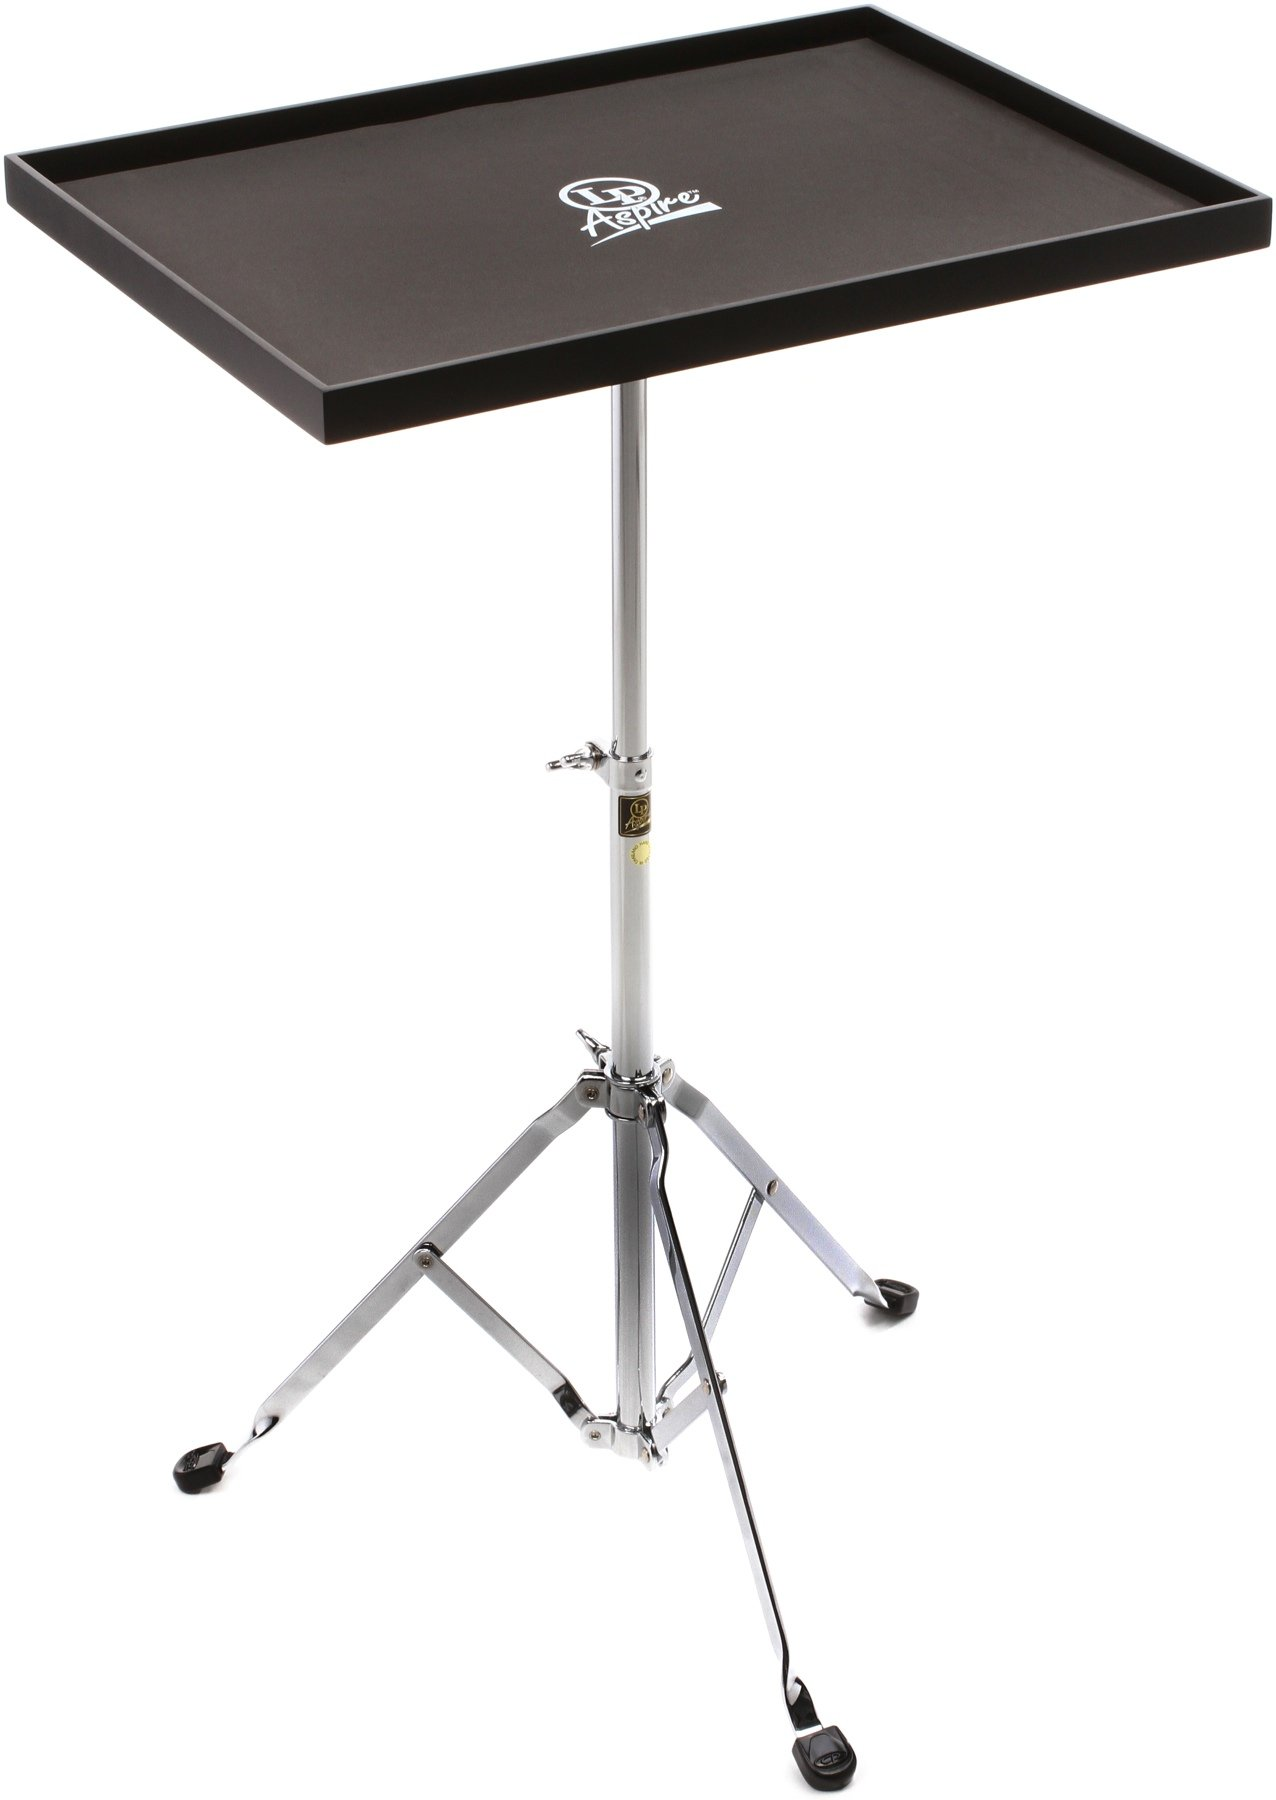 Captivating Latin Percussion Aspire Series Trap Table Image 1